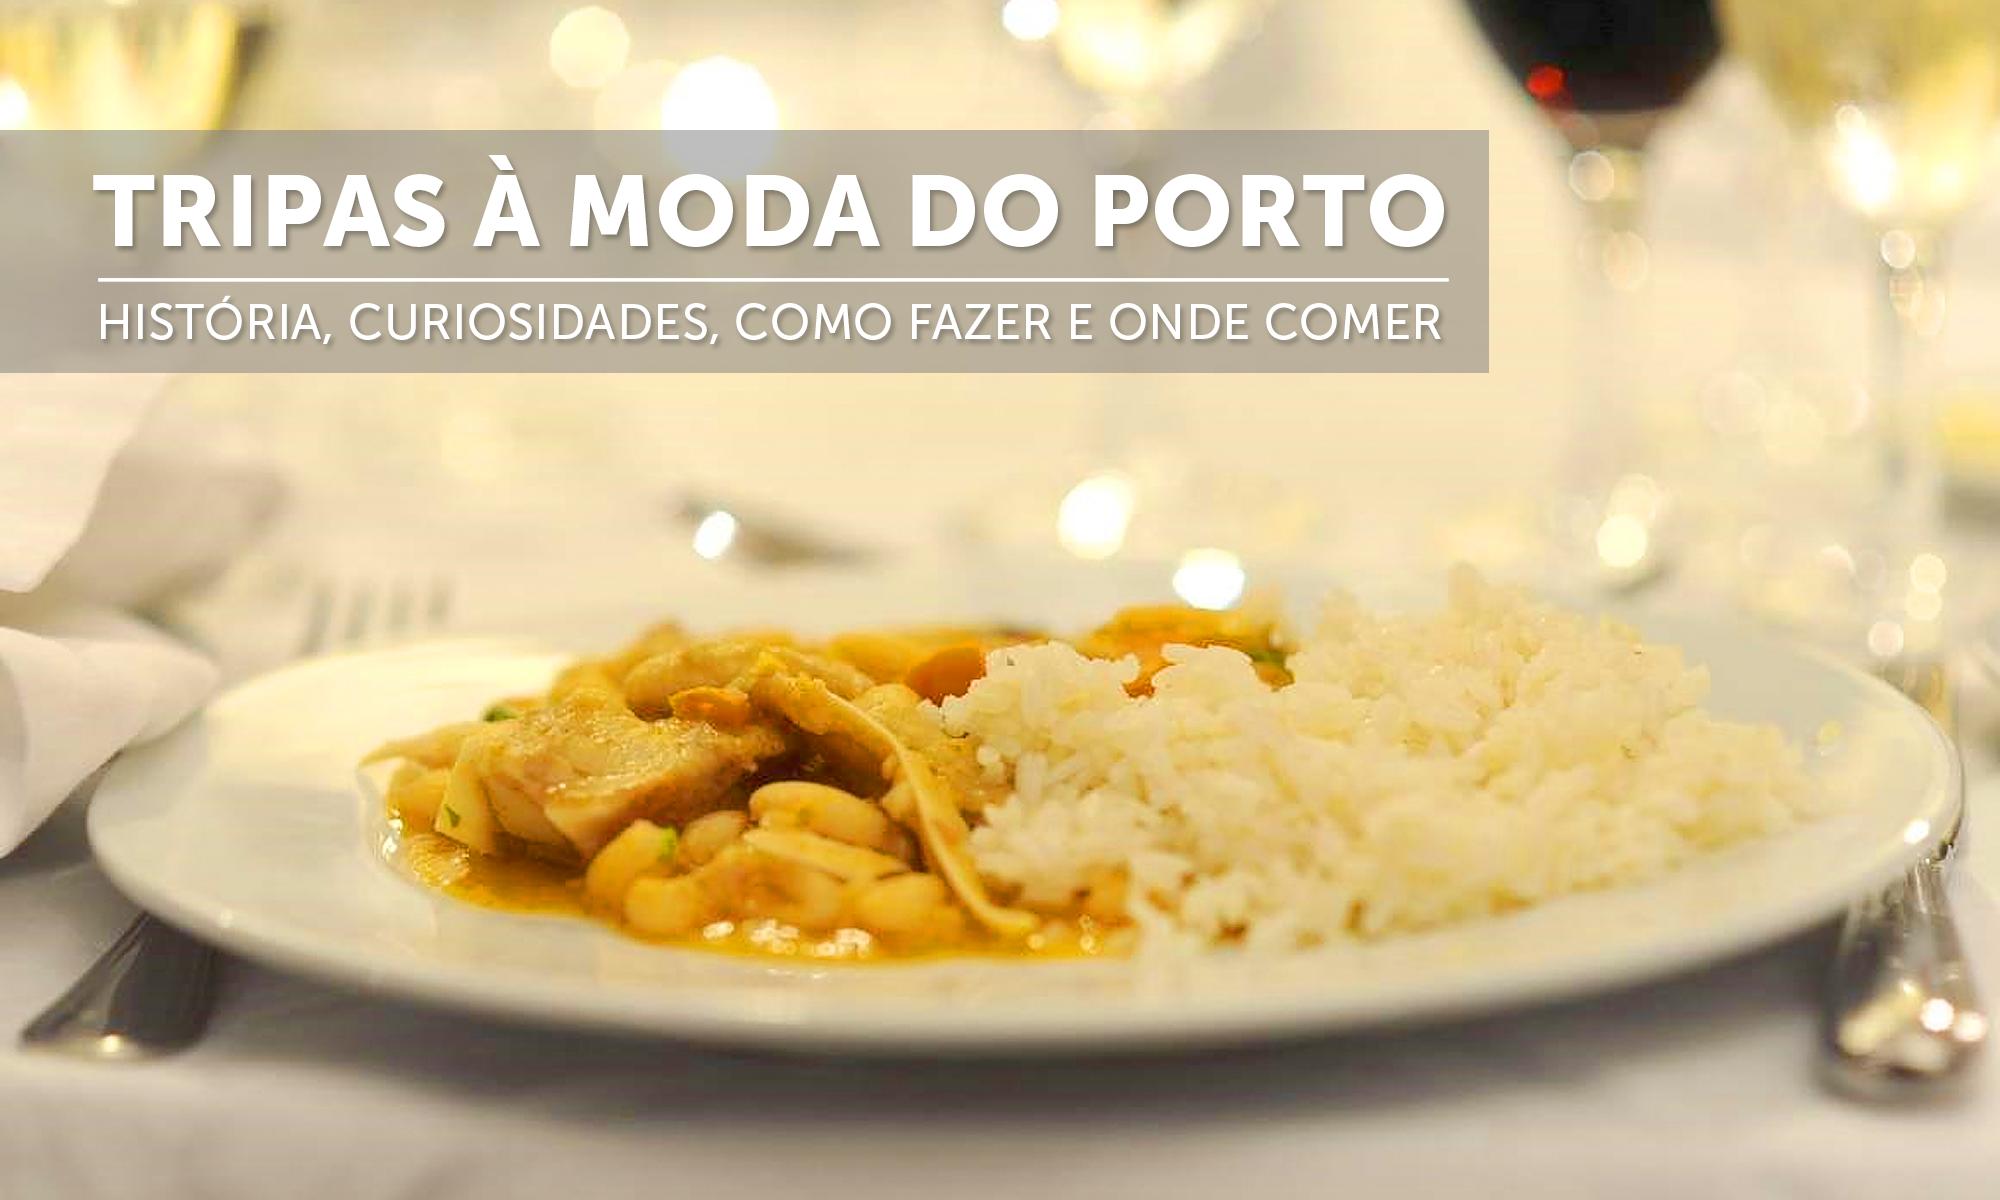 historia-tripas-moda-porto-receita-onde-comer